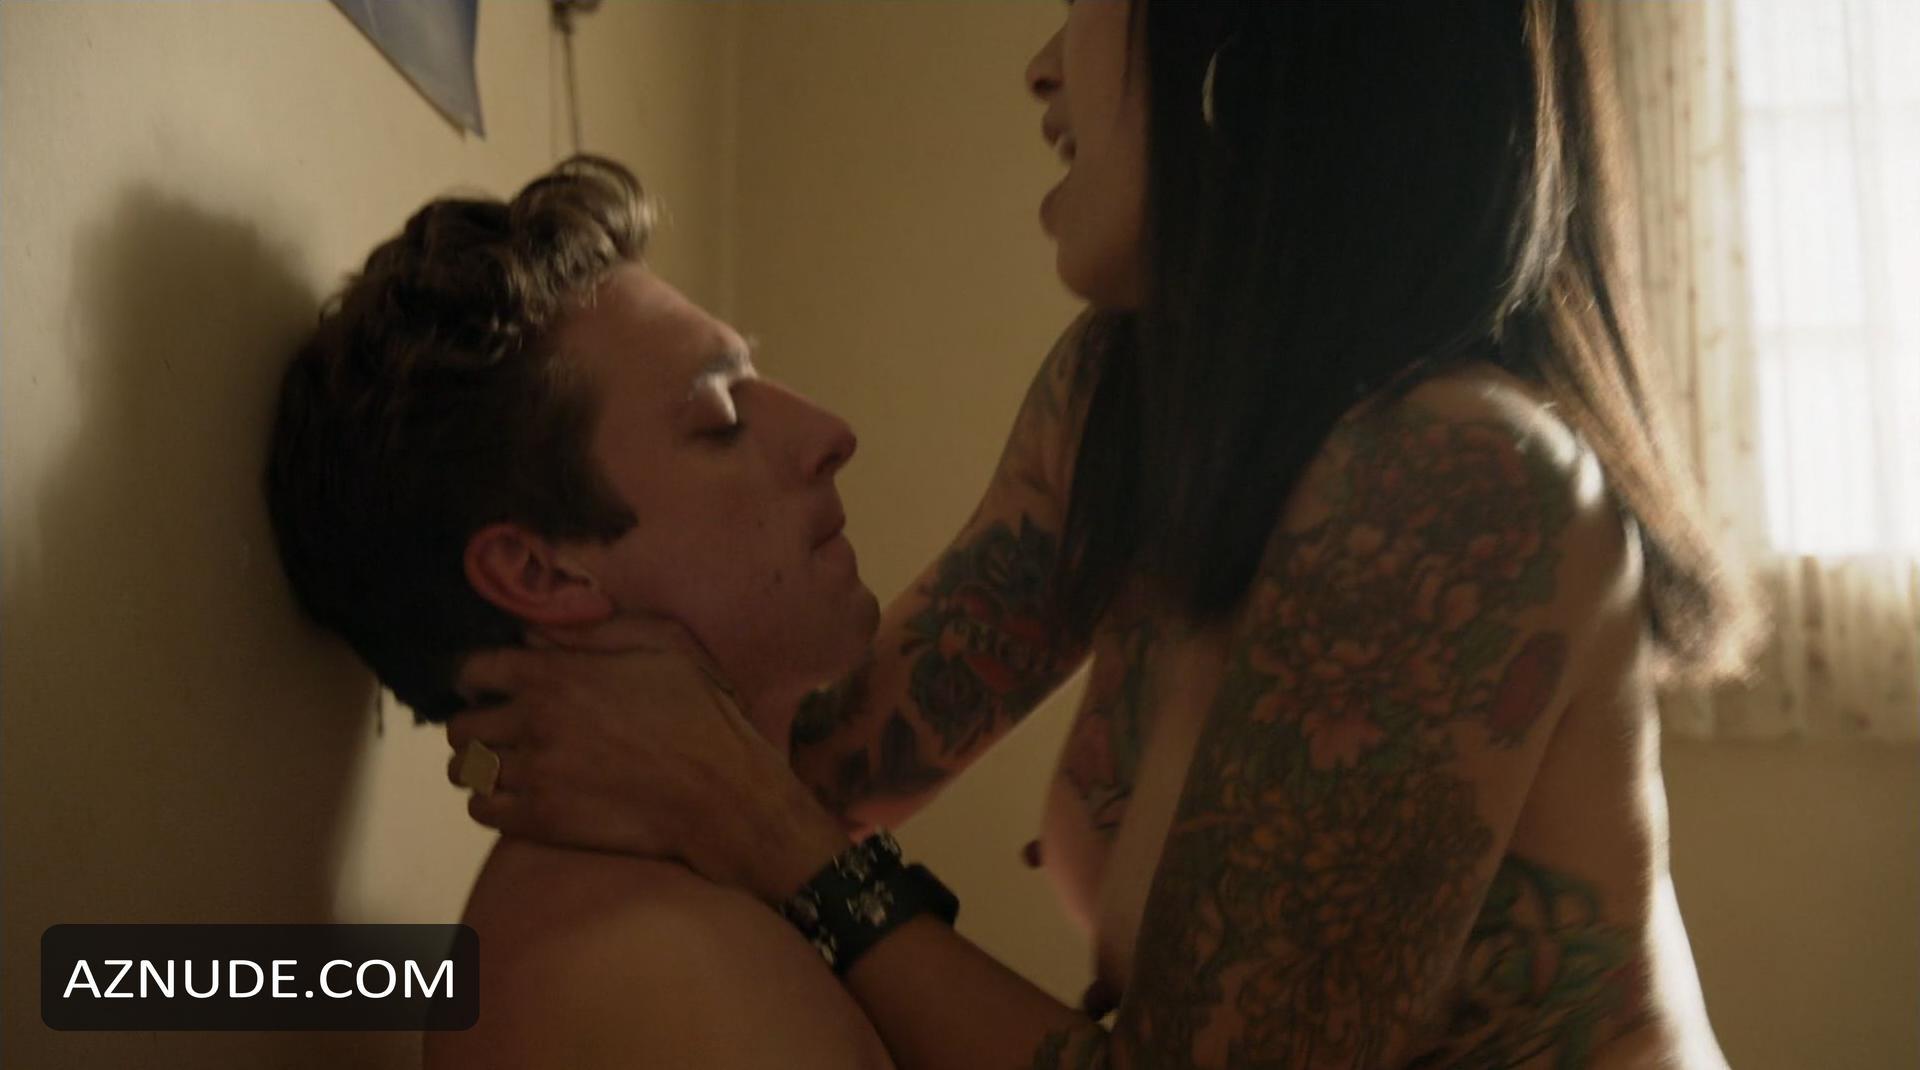 Dakota johnson naked scene in suspiria on scandalplanetcom - 2 2